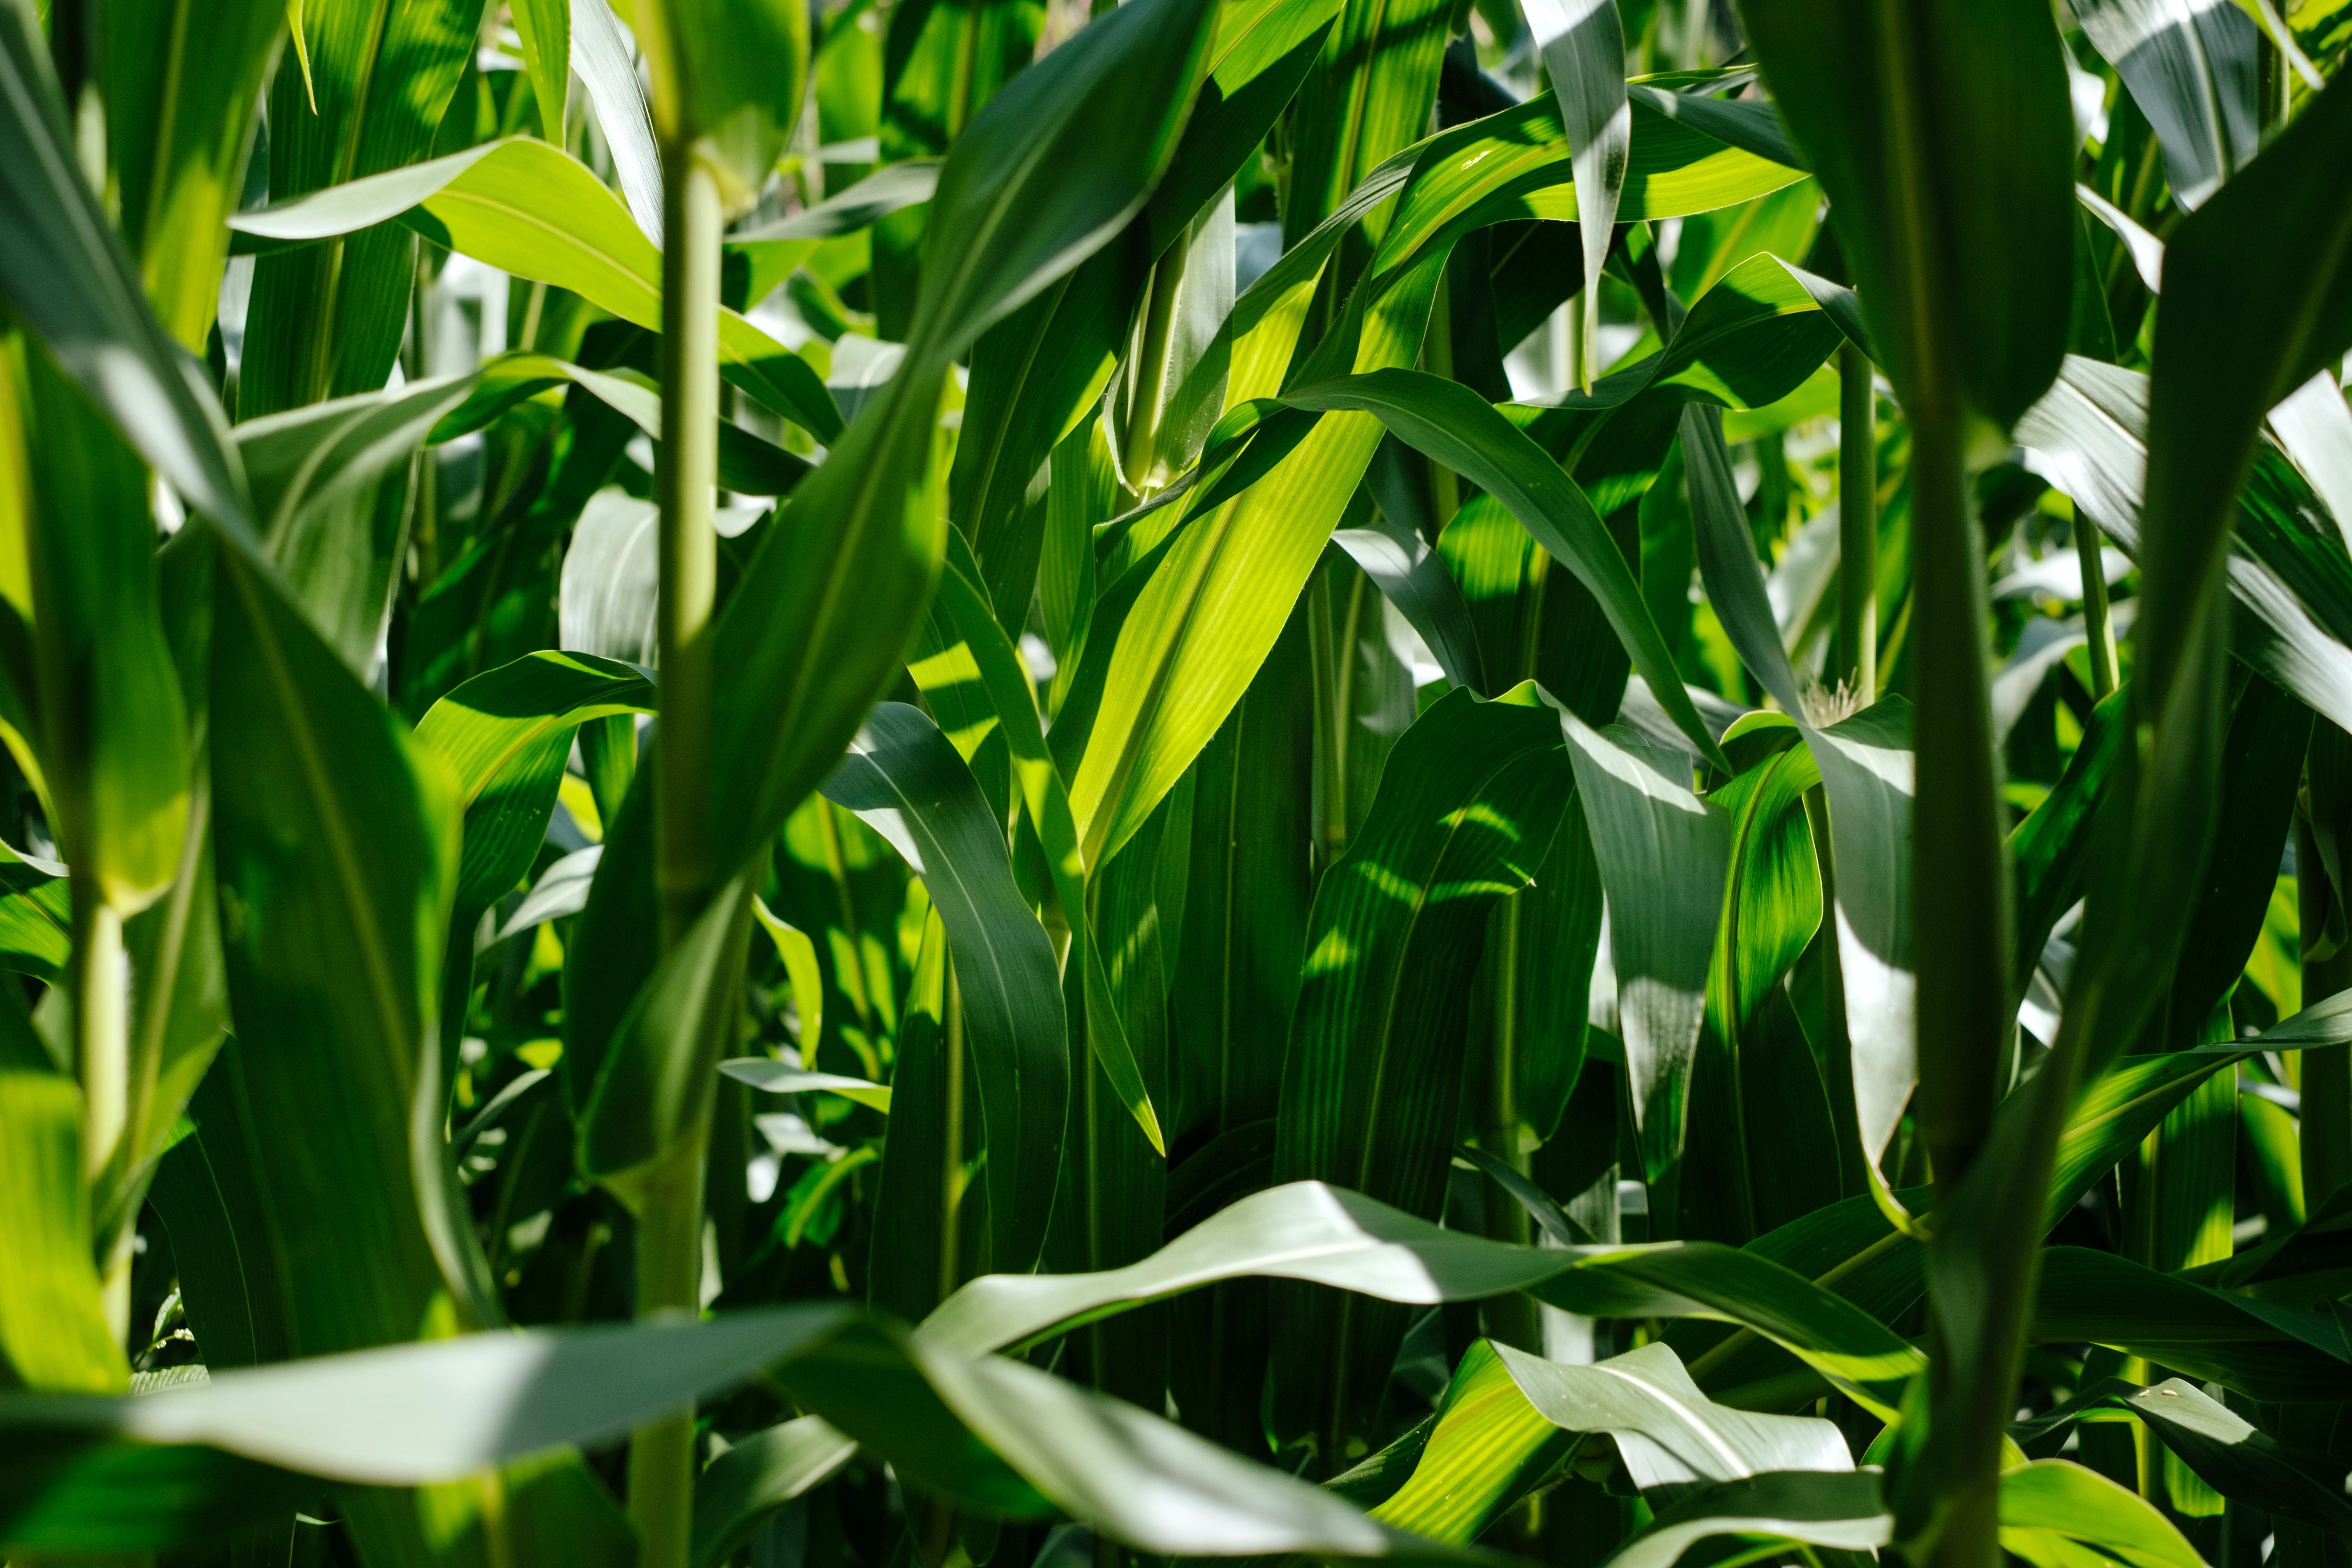 photo of green corn plants